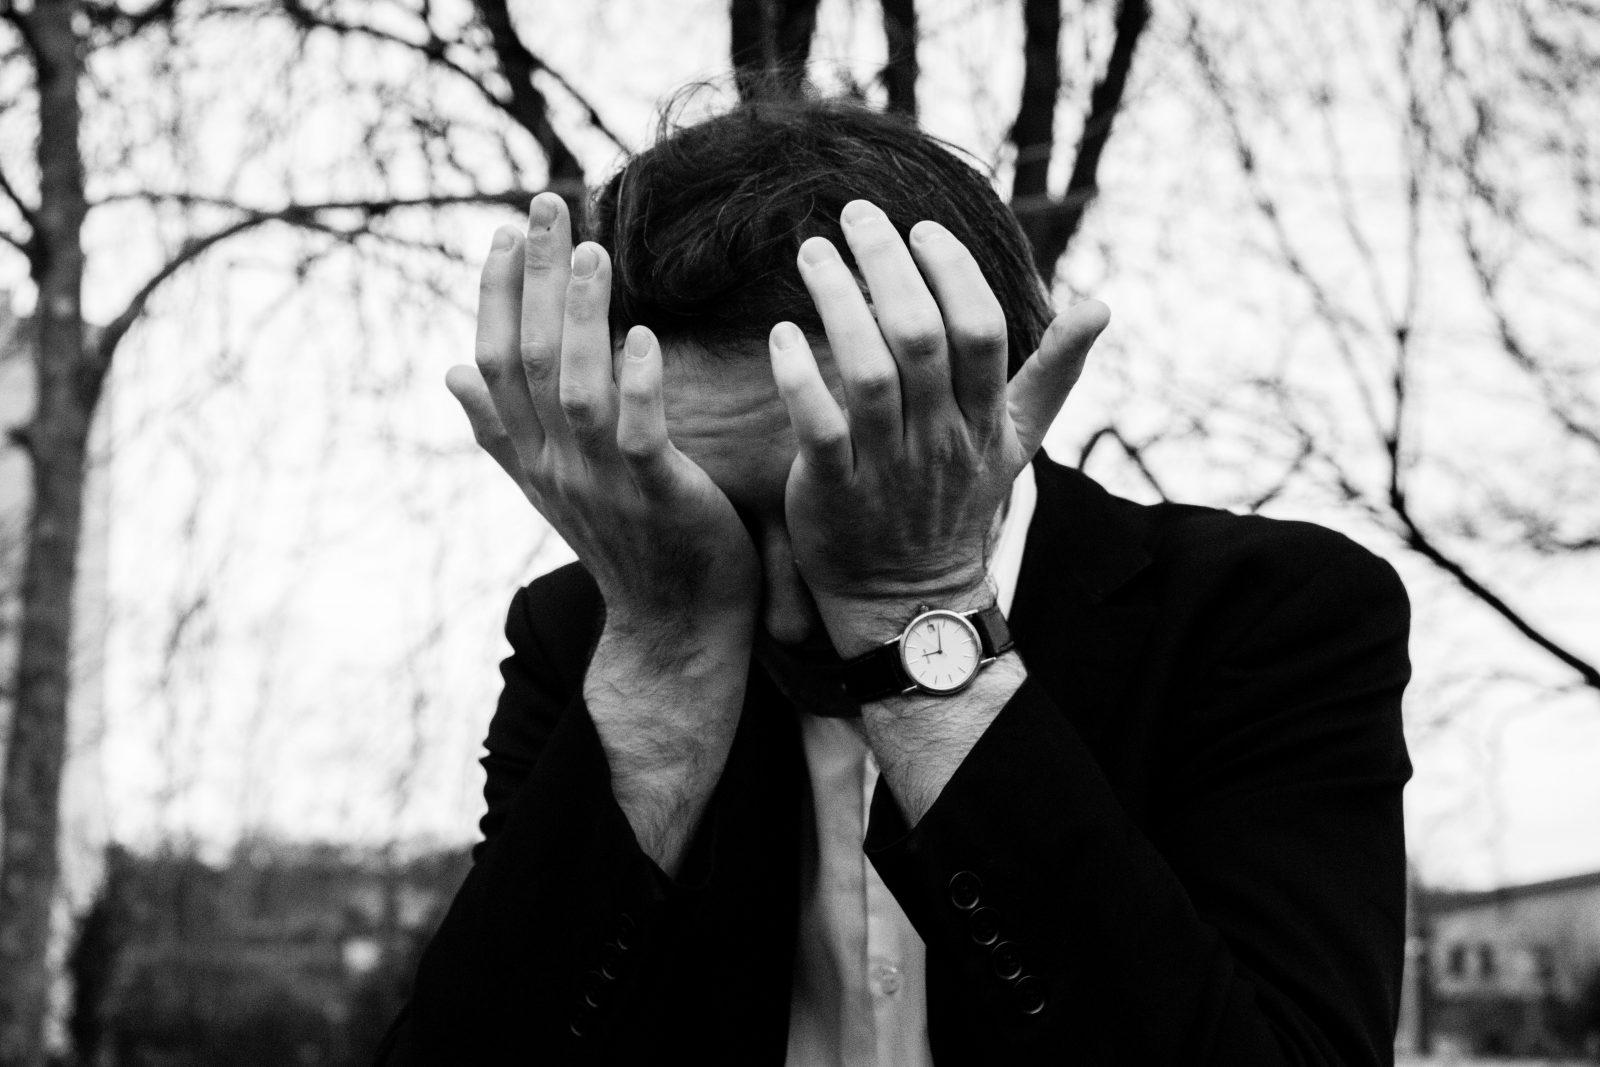 futher misadventures of an accidental gig promoter: ben marwood backs off;